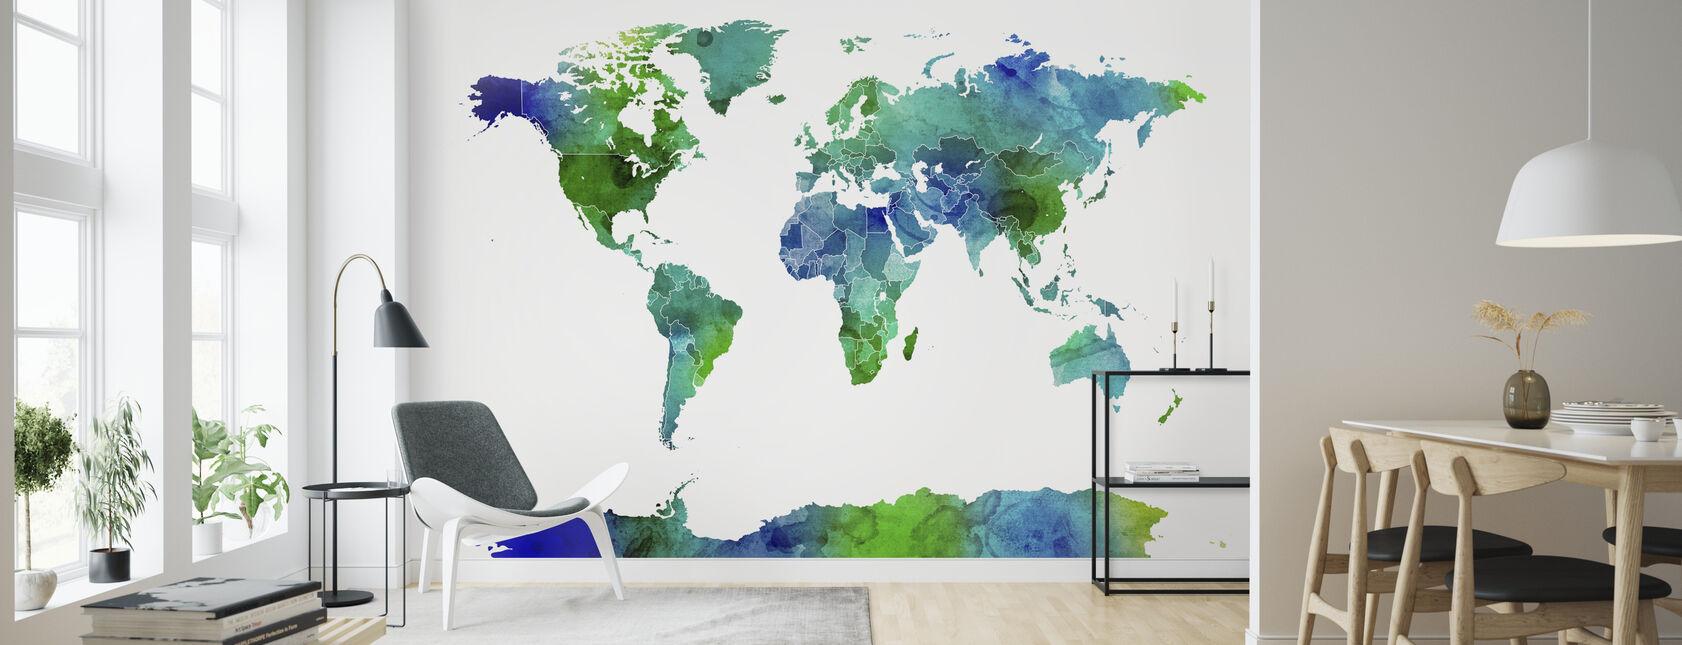 Watercolor World Map Blue & Green - Wallpaper - Living Room